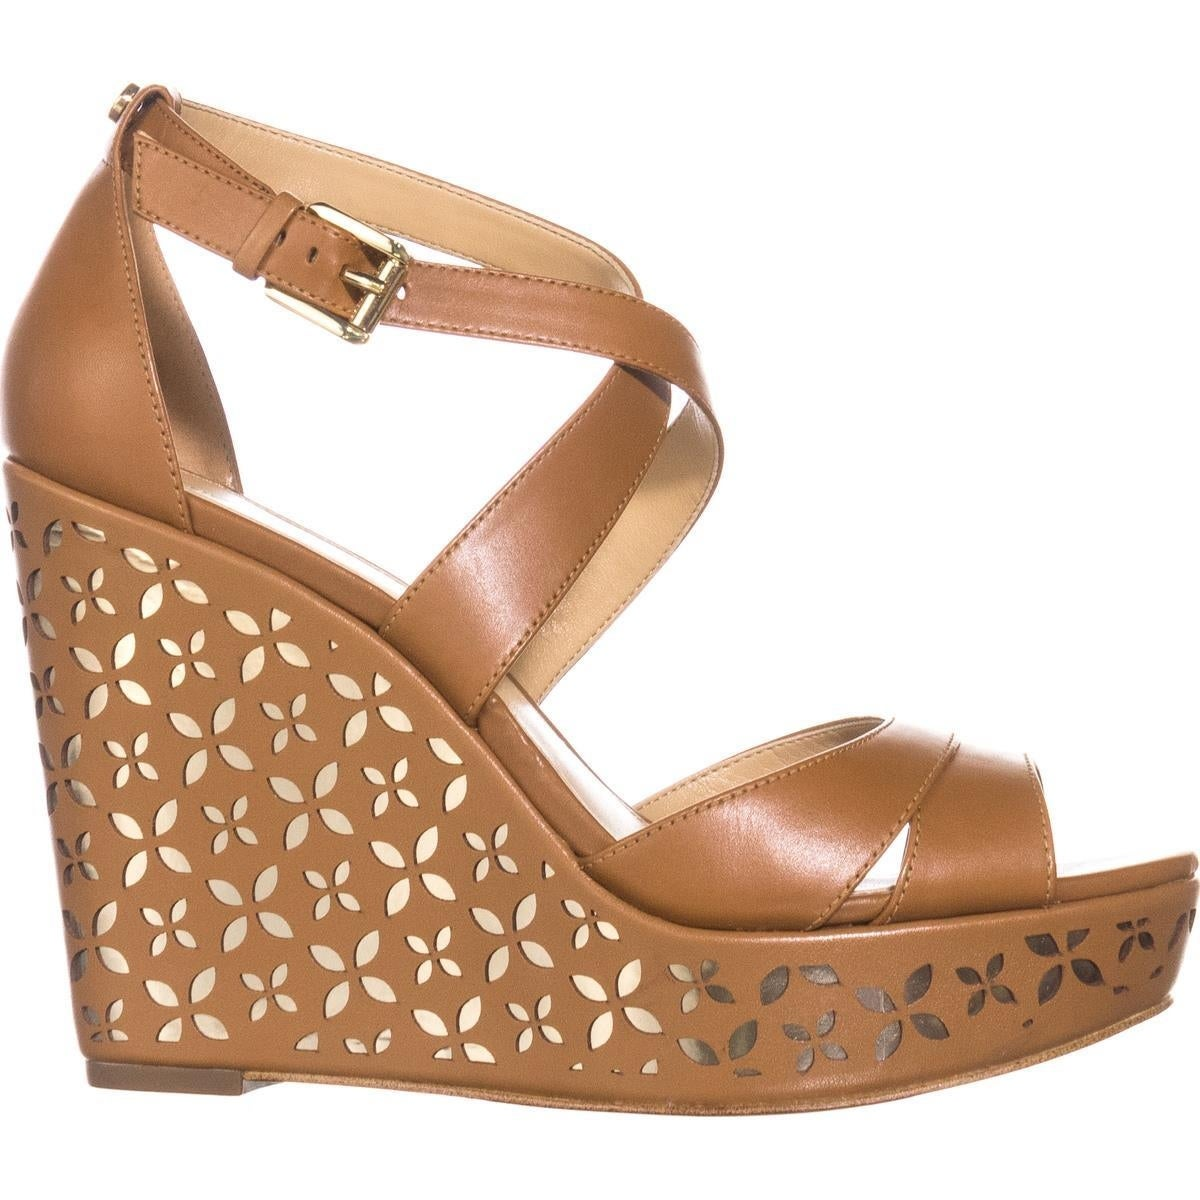 9637c9fa26f Shop MICHAEL Michael Kors Sienna Floral Wedge Sandals